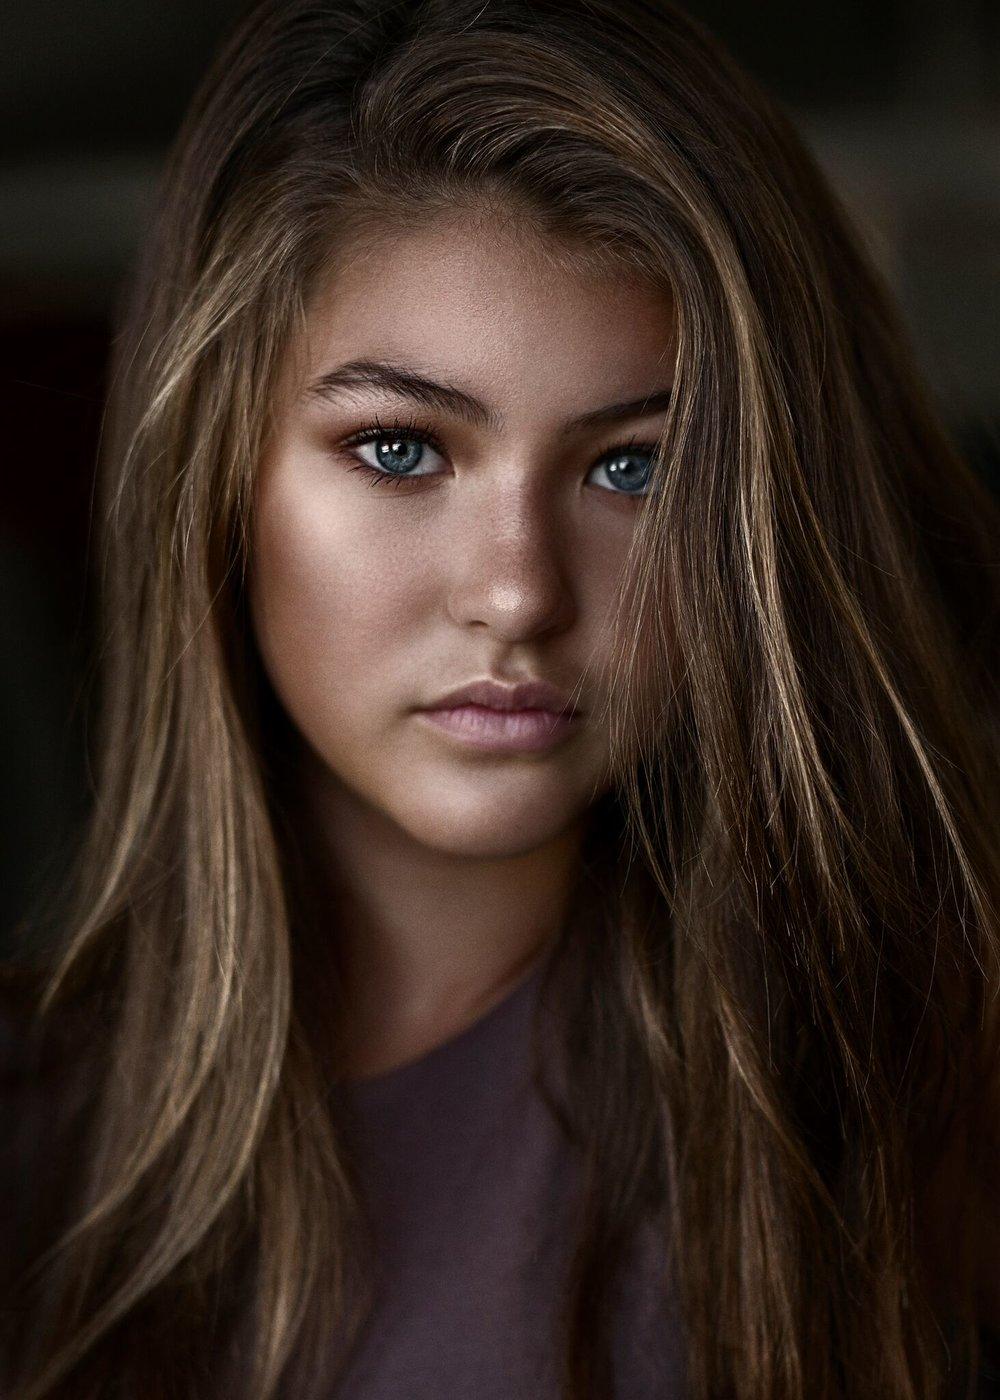 Sienna Davis, Model Citizen Magazine, Model Citizen App